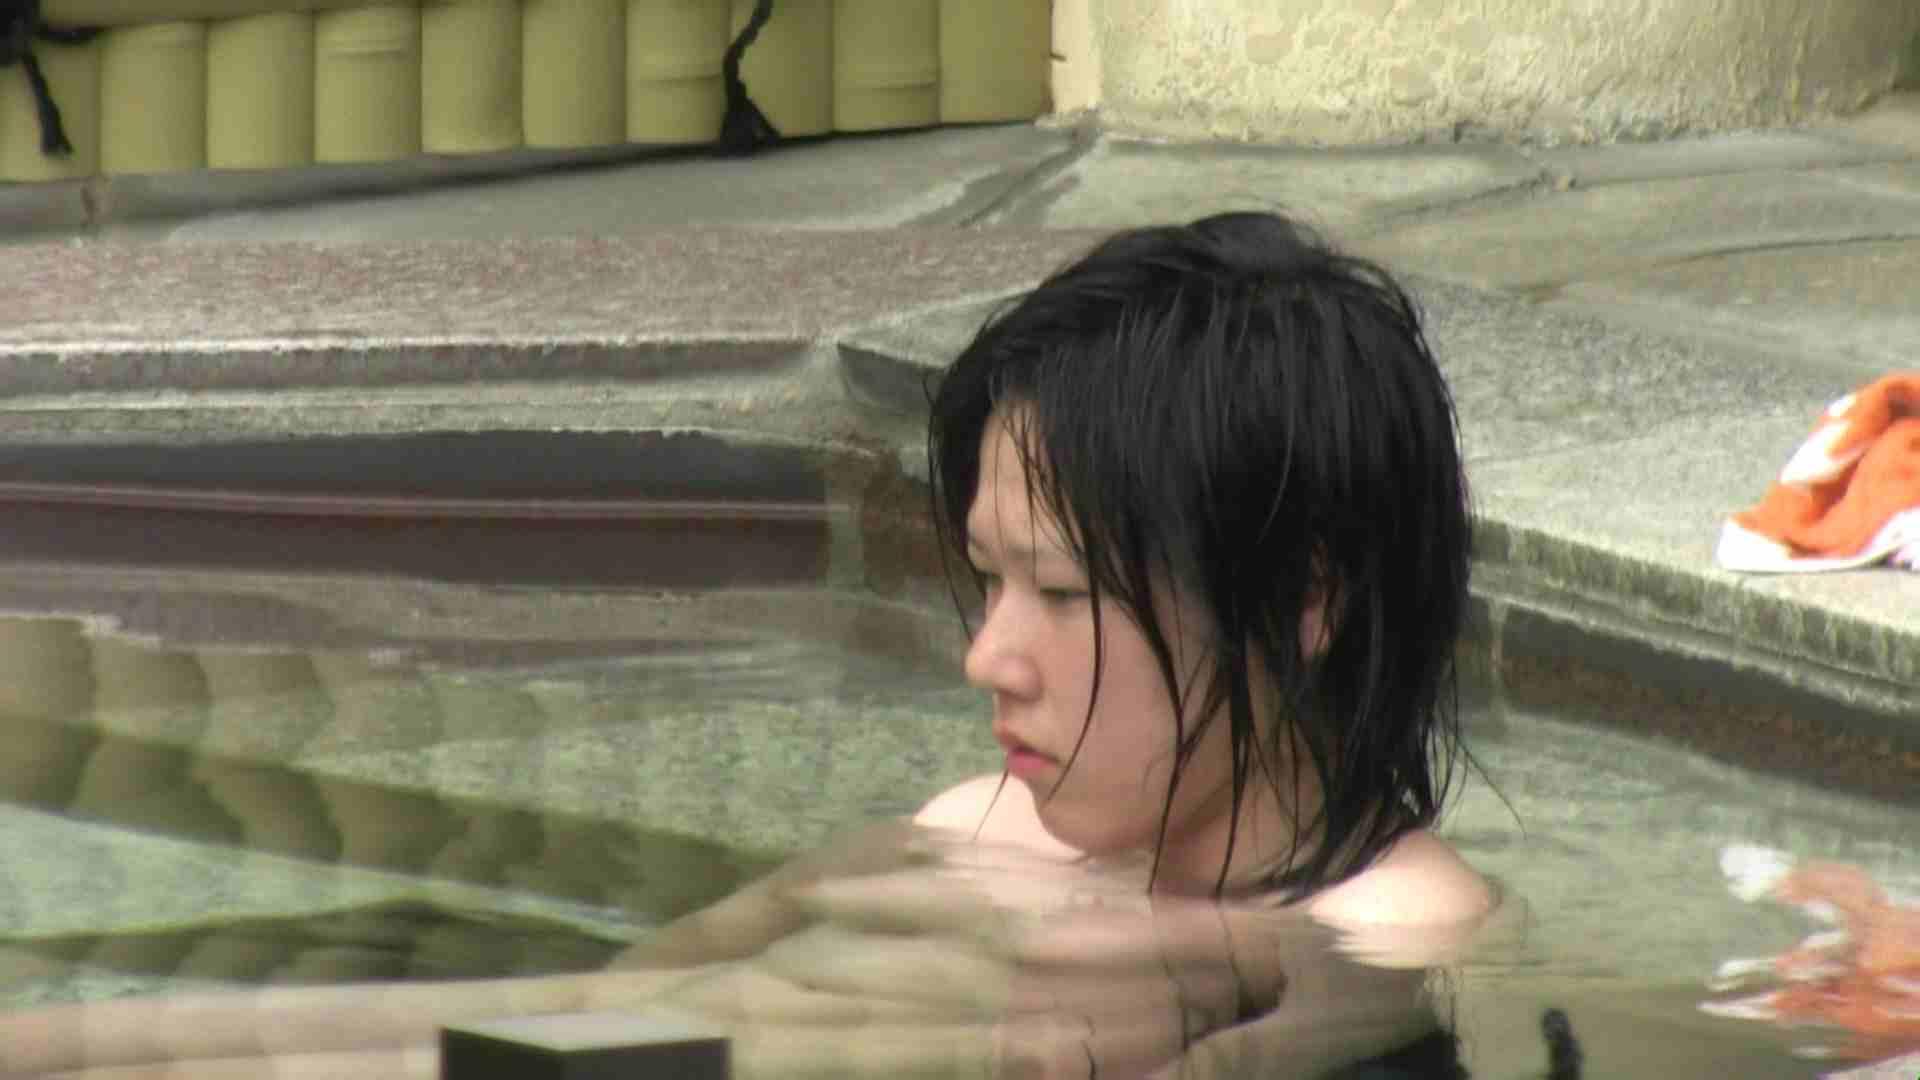 Aquaな露天風呂Vol.36 盗撮 | HなOL  68pic 40